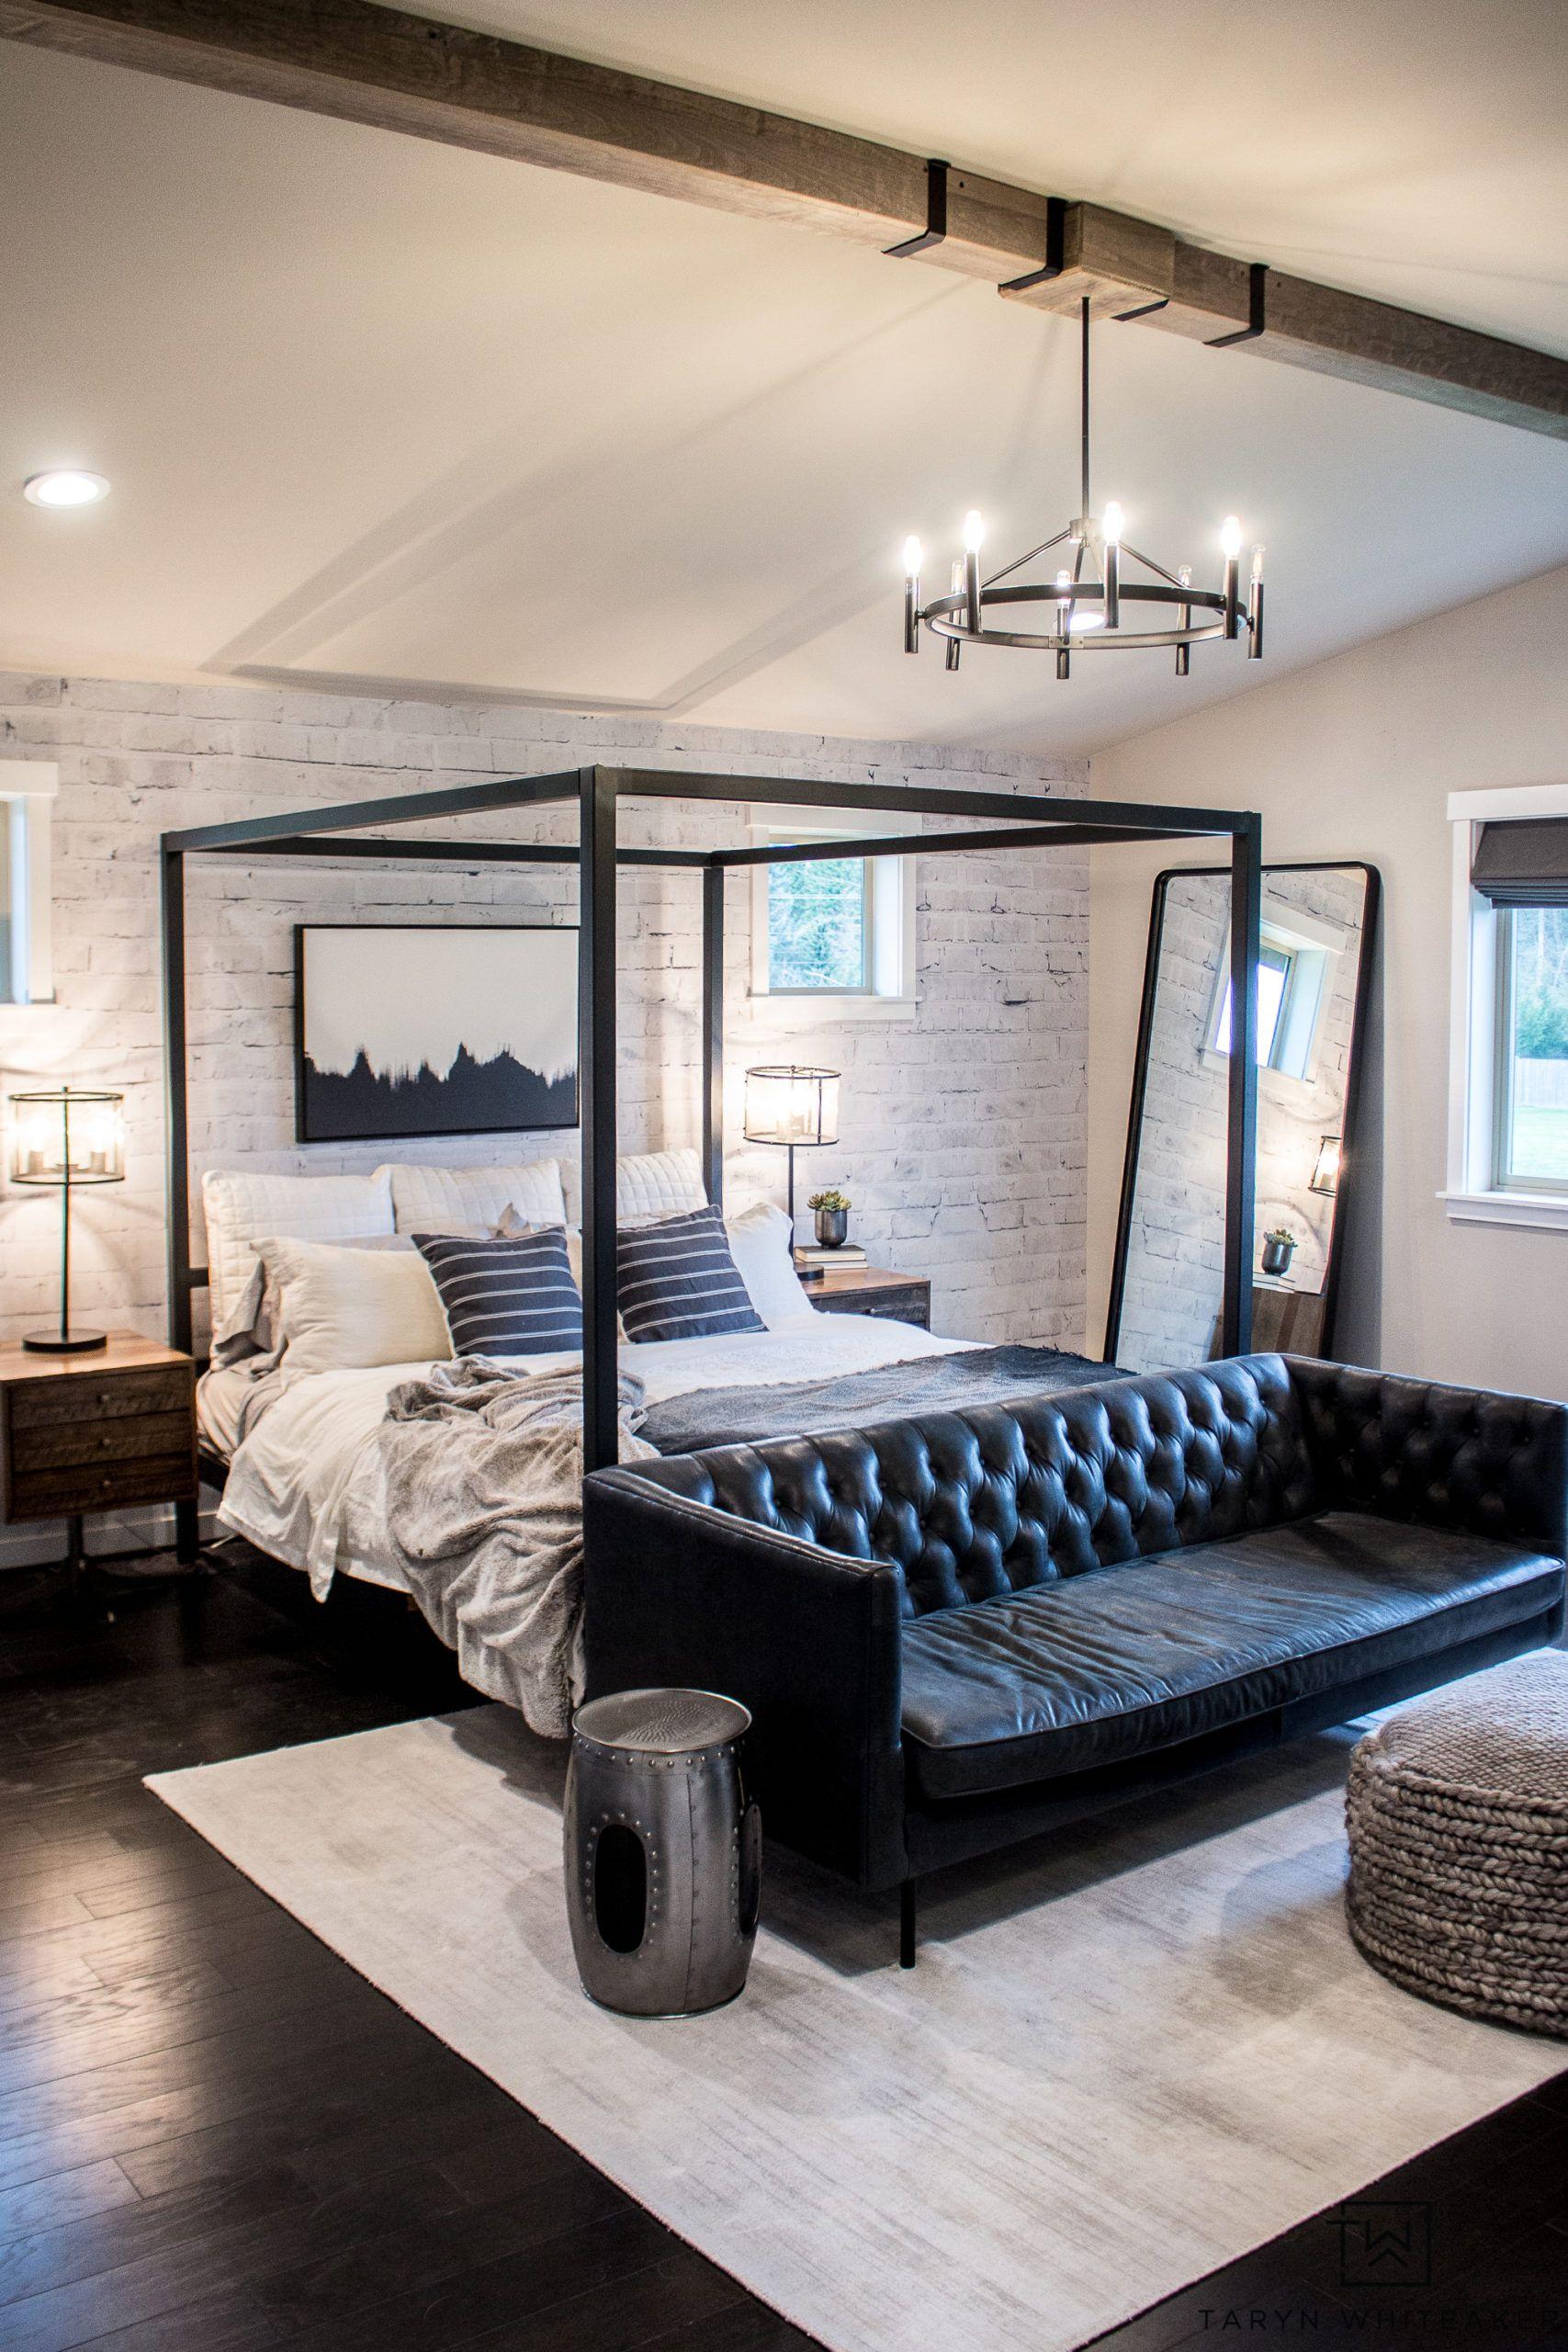 Black And White Master Bedroom Reveal Taryn Whiteaker In 2020 White Master Bedroom Master Bedroom Set Master Bedroom Makeover